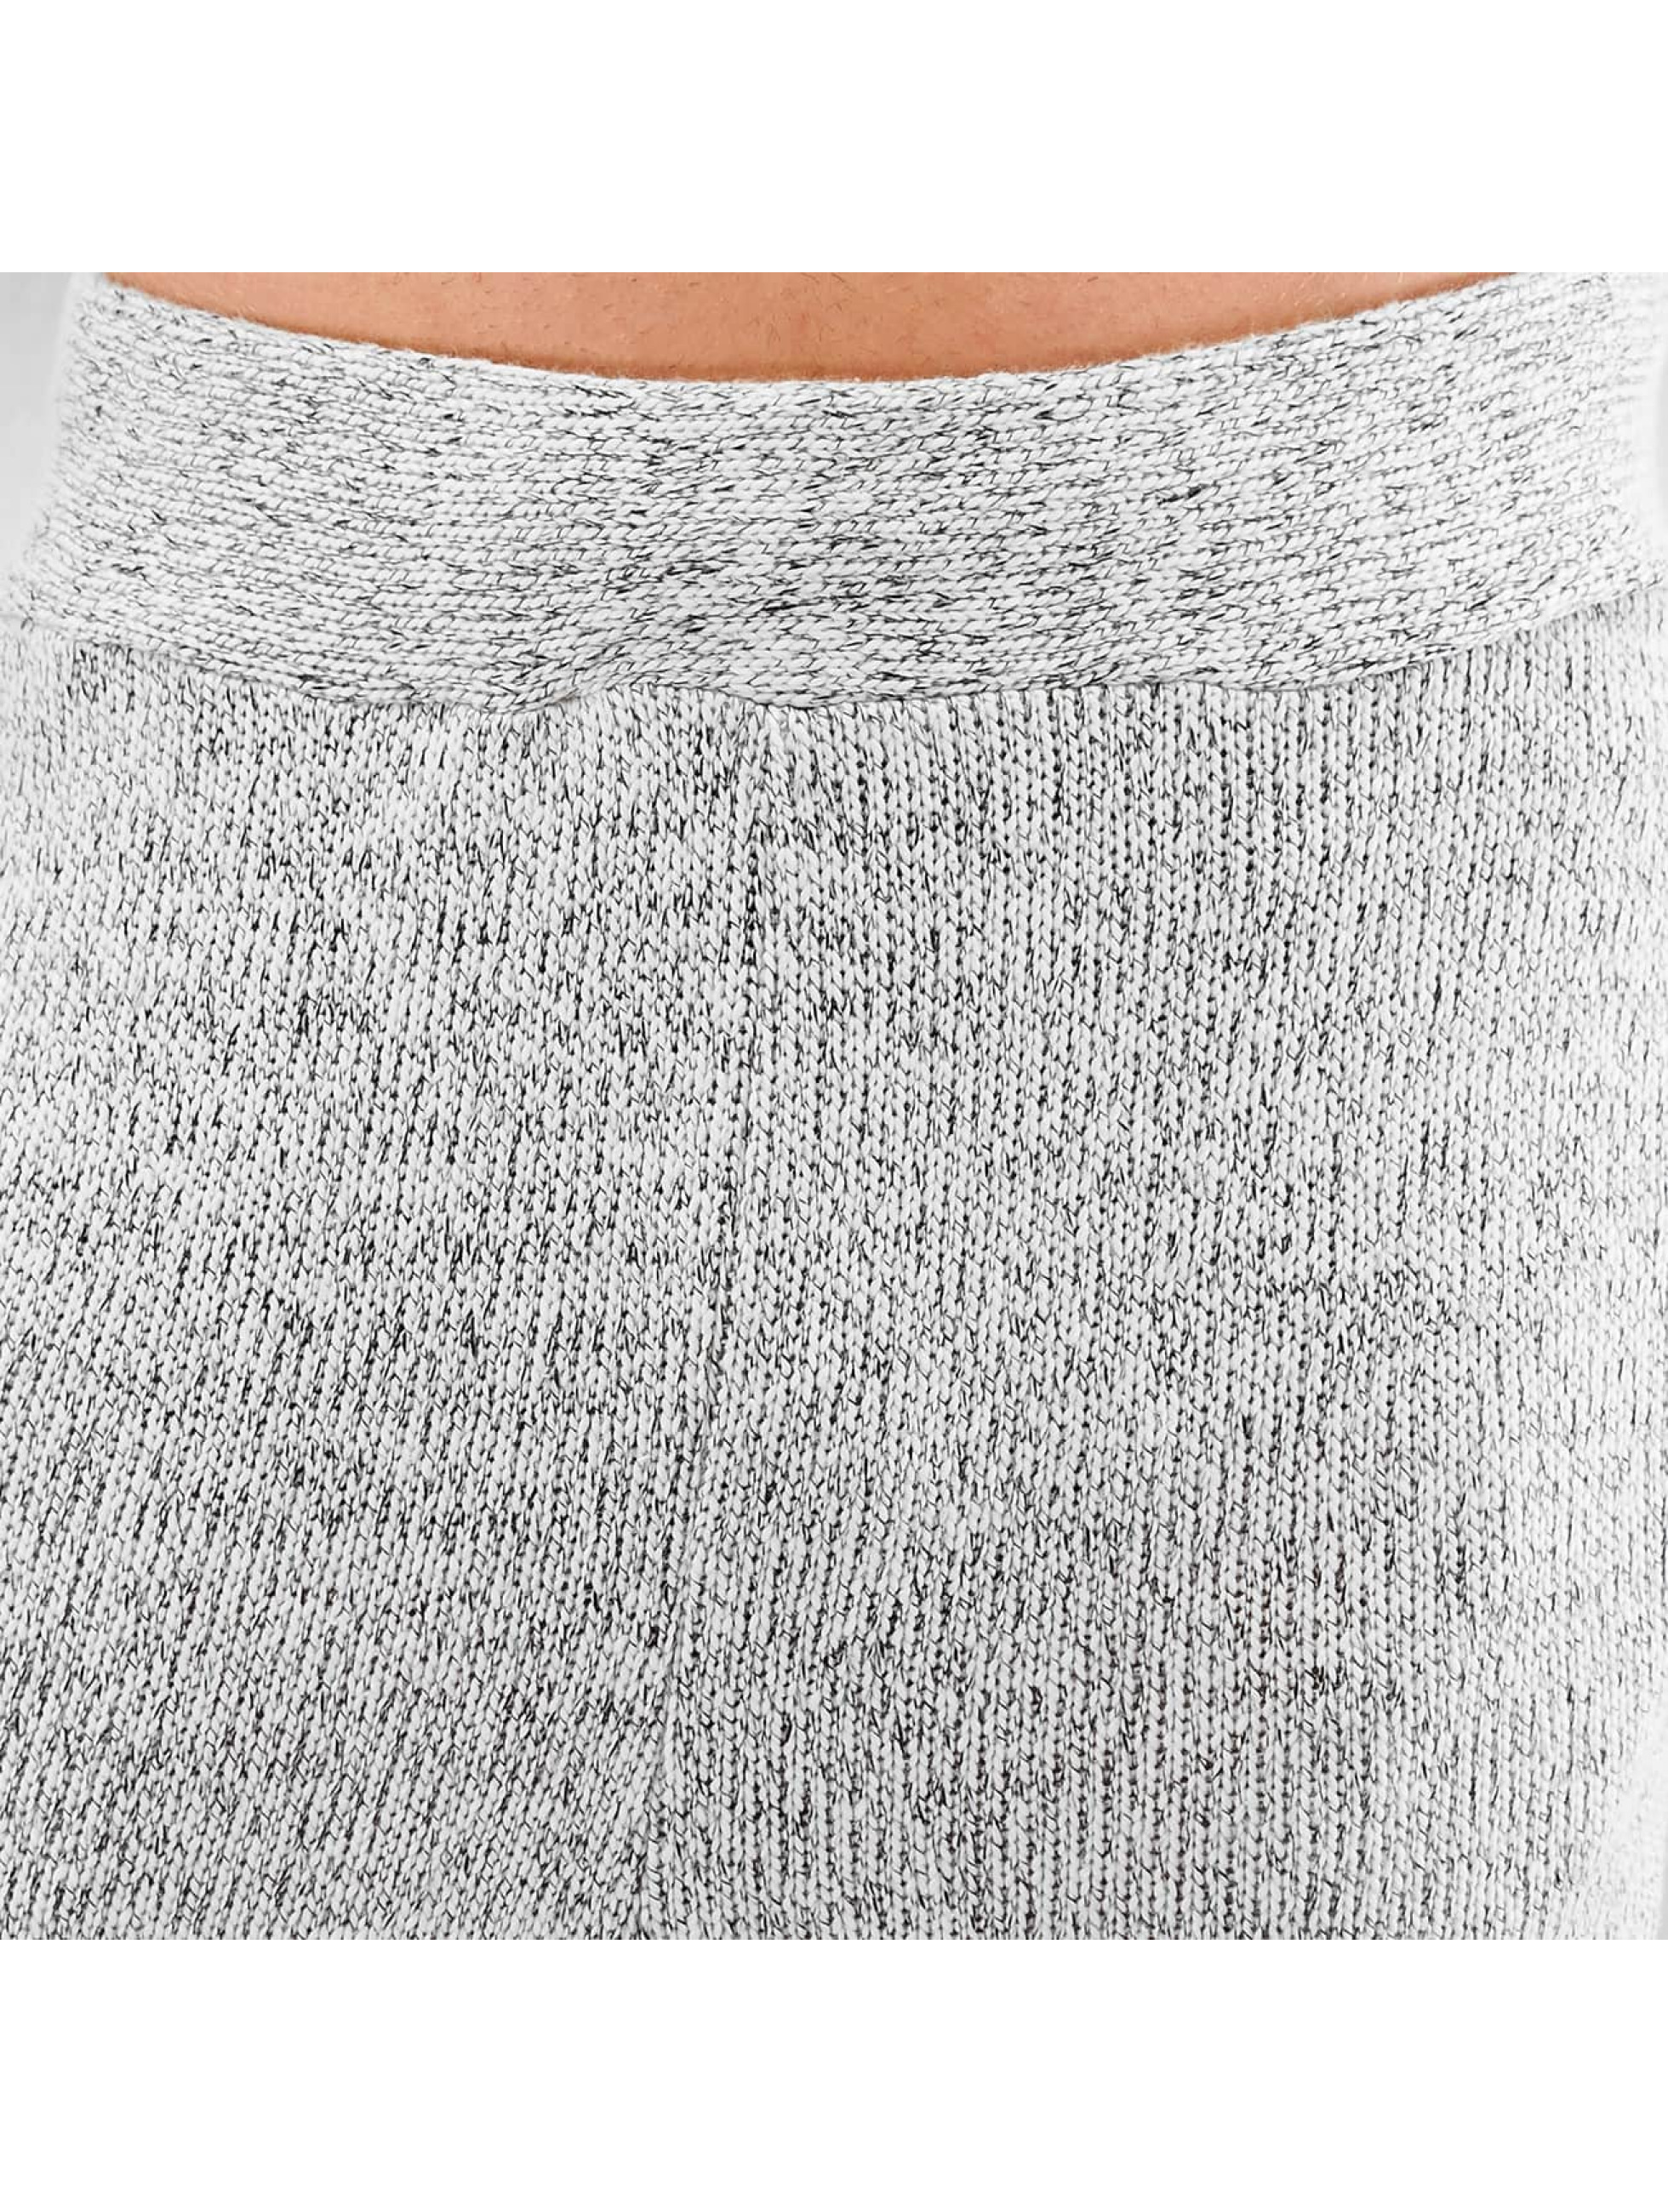 DEF Sweat Pant Knit gray